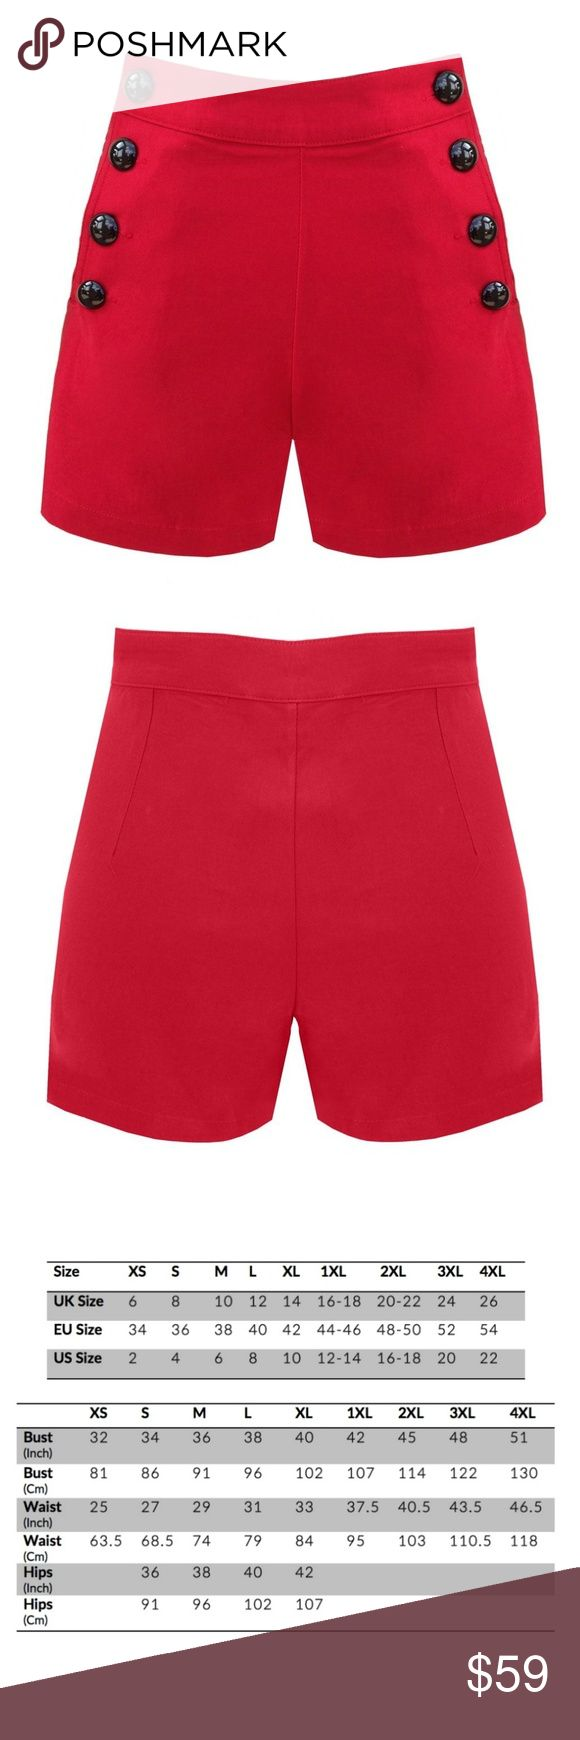 Pin Up High Waist Shorts Clothing Stretch Button NEW WITH TAGS Pin Up High Waist Stretch Button Shorts Clothing 70% Cotton, 26 %Nylon,4% Elastane Shorts